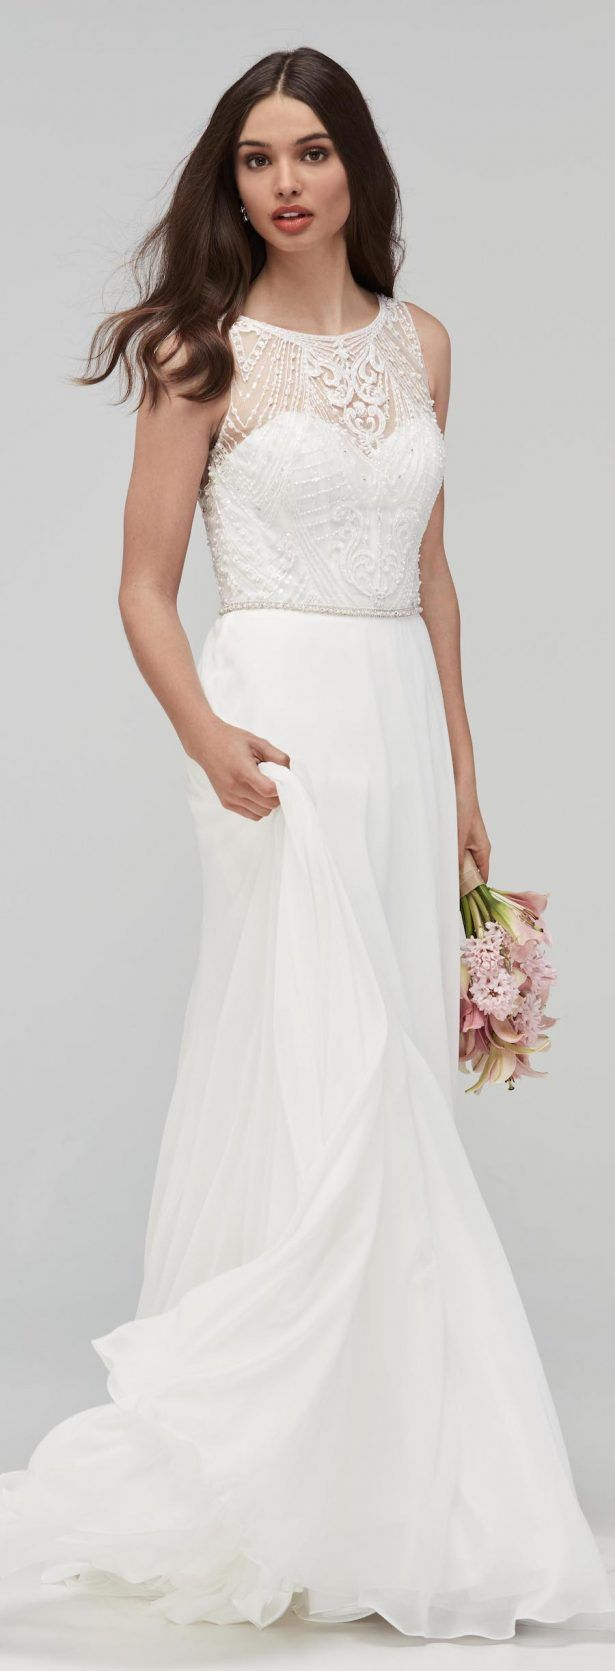 400 best kleider images on Pinterest | Boho wedding, Short wedding ...